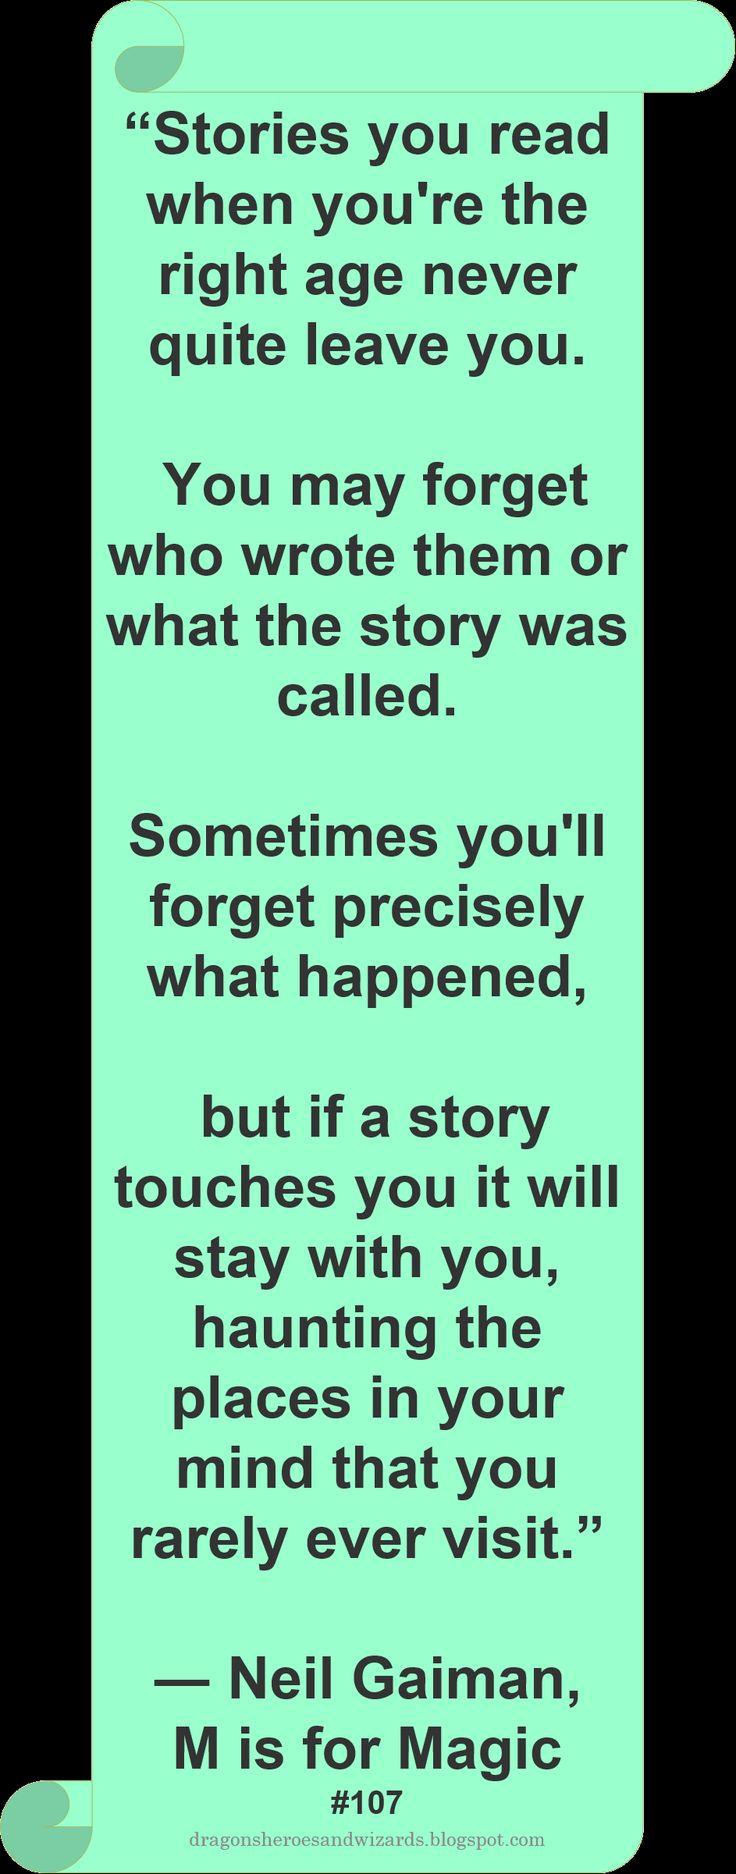 ♥ Neil Gaiman ♥ #Quote #Stories